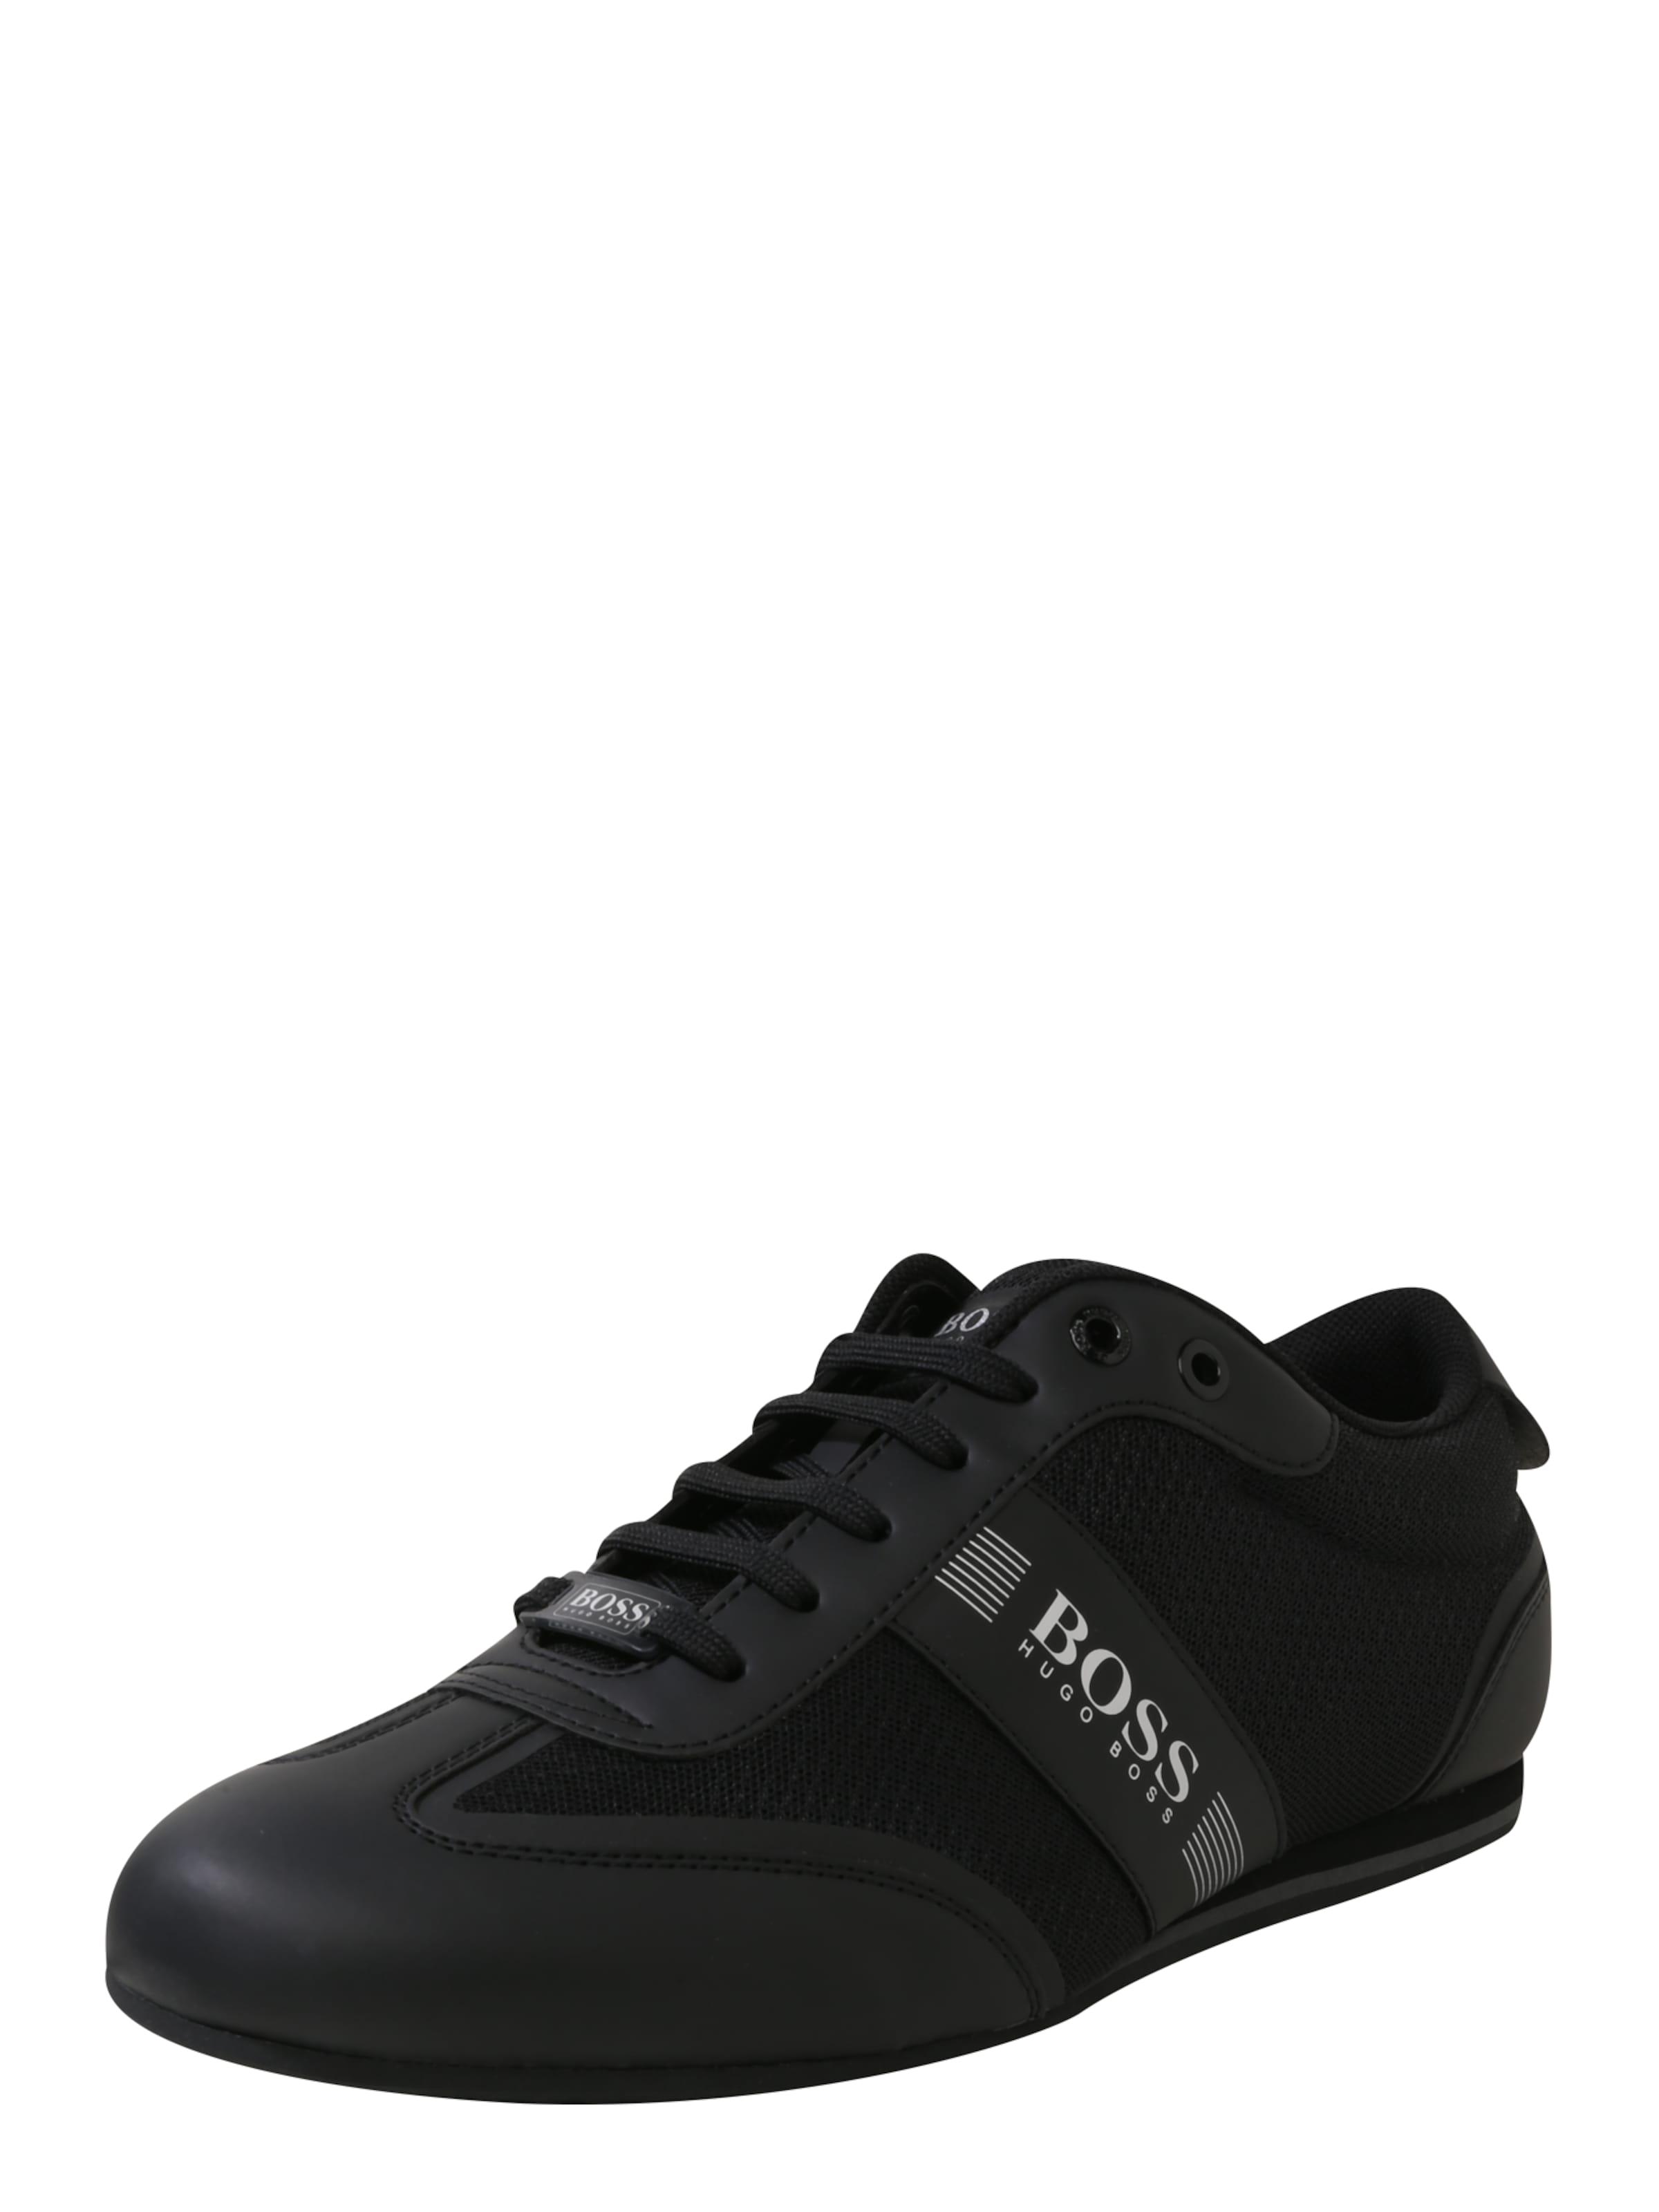 BOSS Sneaker Ligter Verschleißfeste billige Schuhe